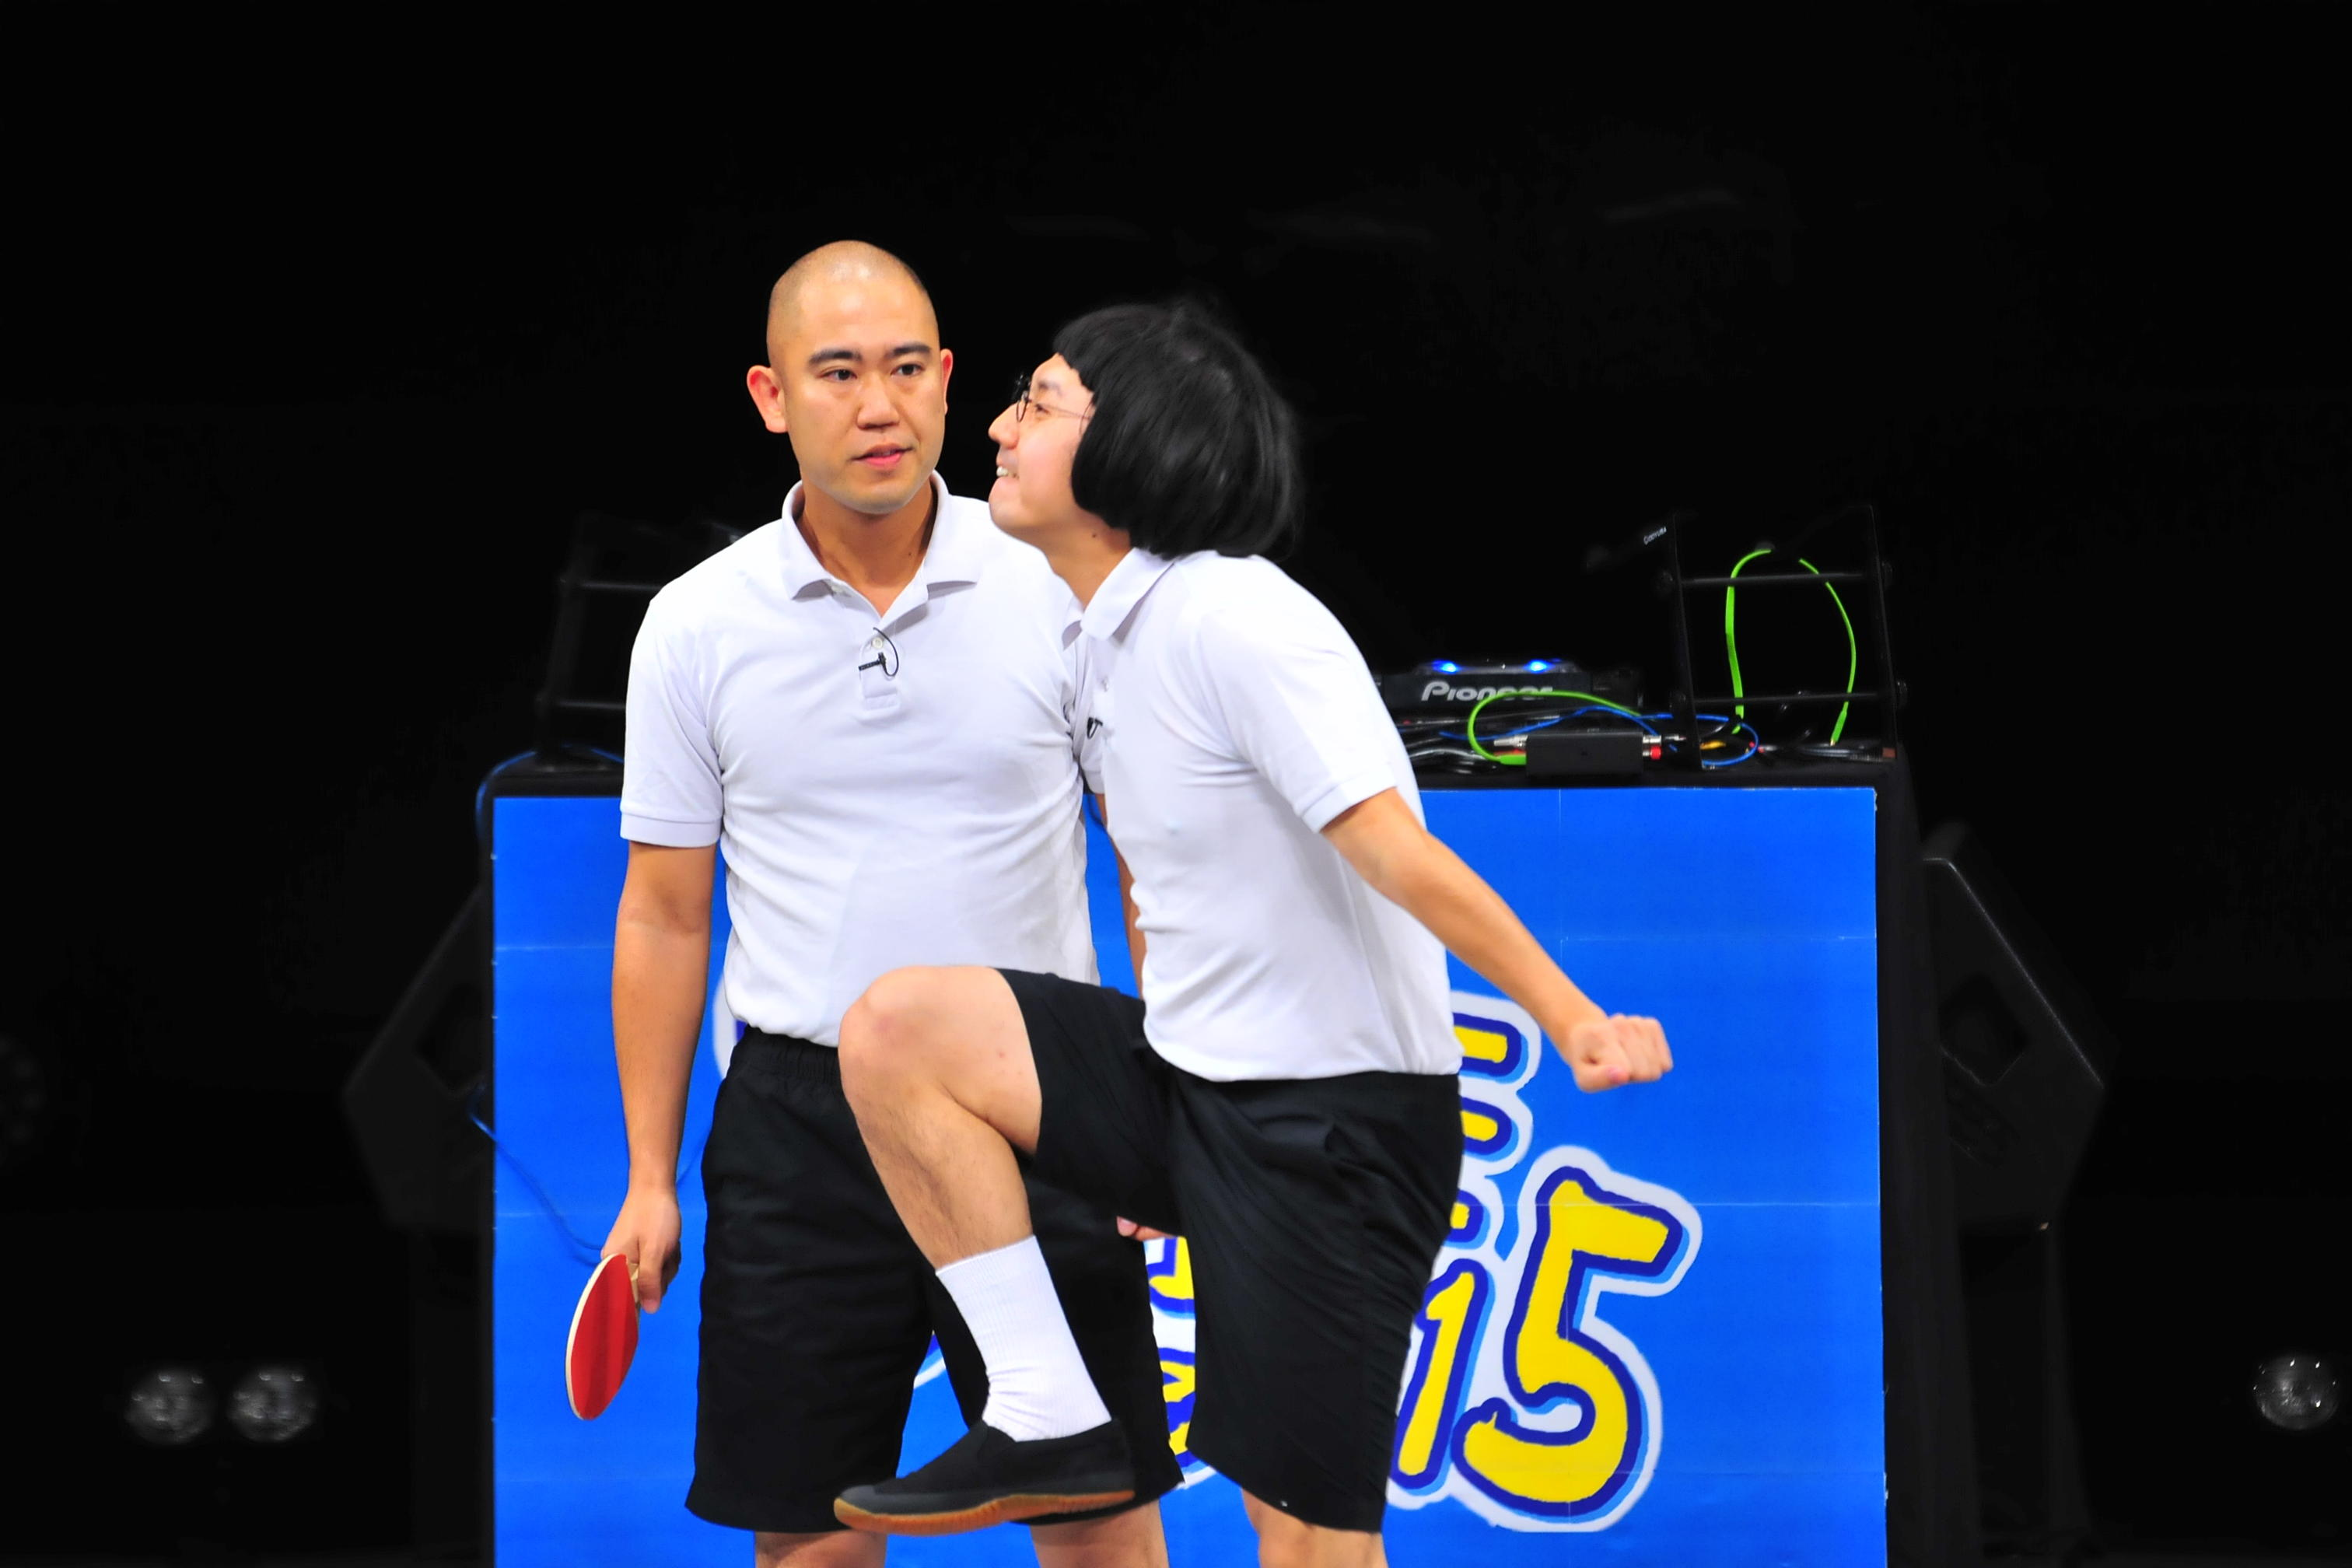 http://news.yoshimoto.co.jp/20151231142726-76c2e5bd23d3da5123b5e02971f59daf03133ae6.jpg